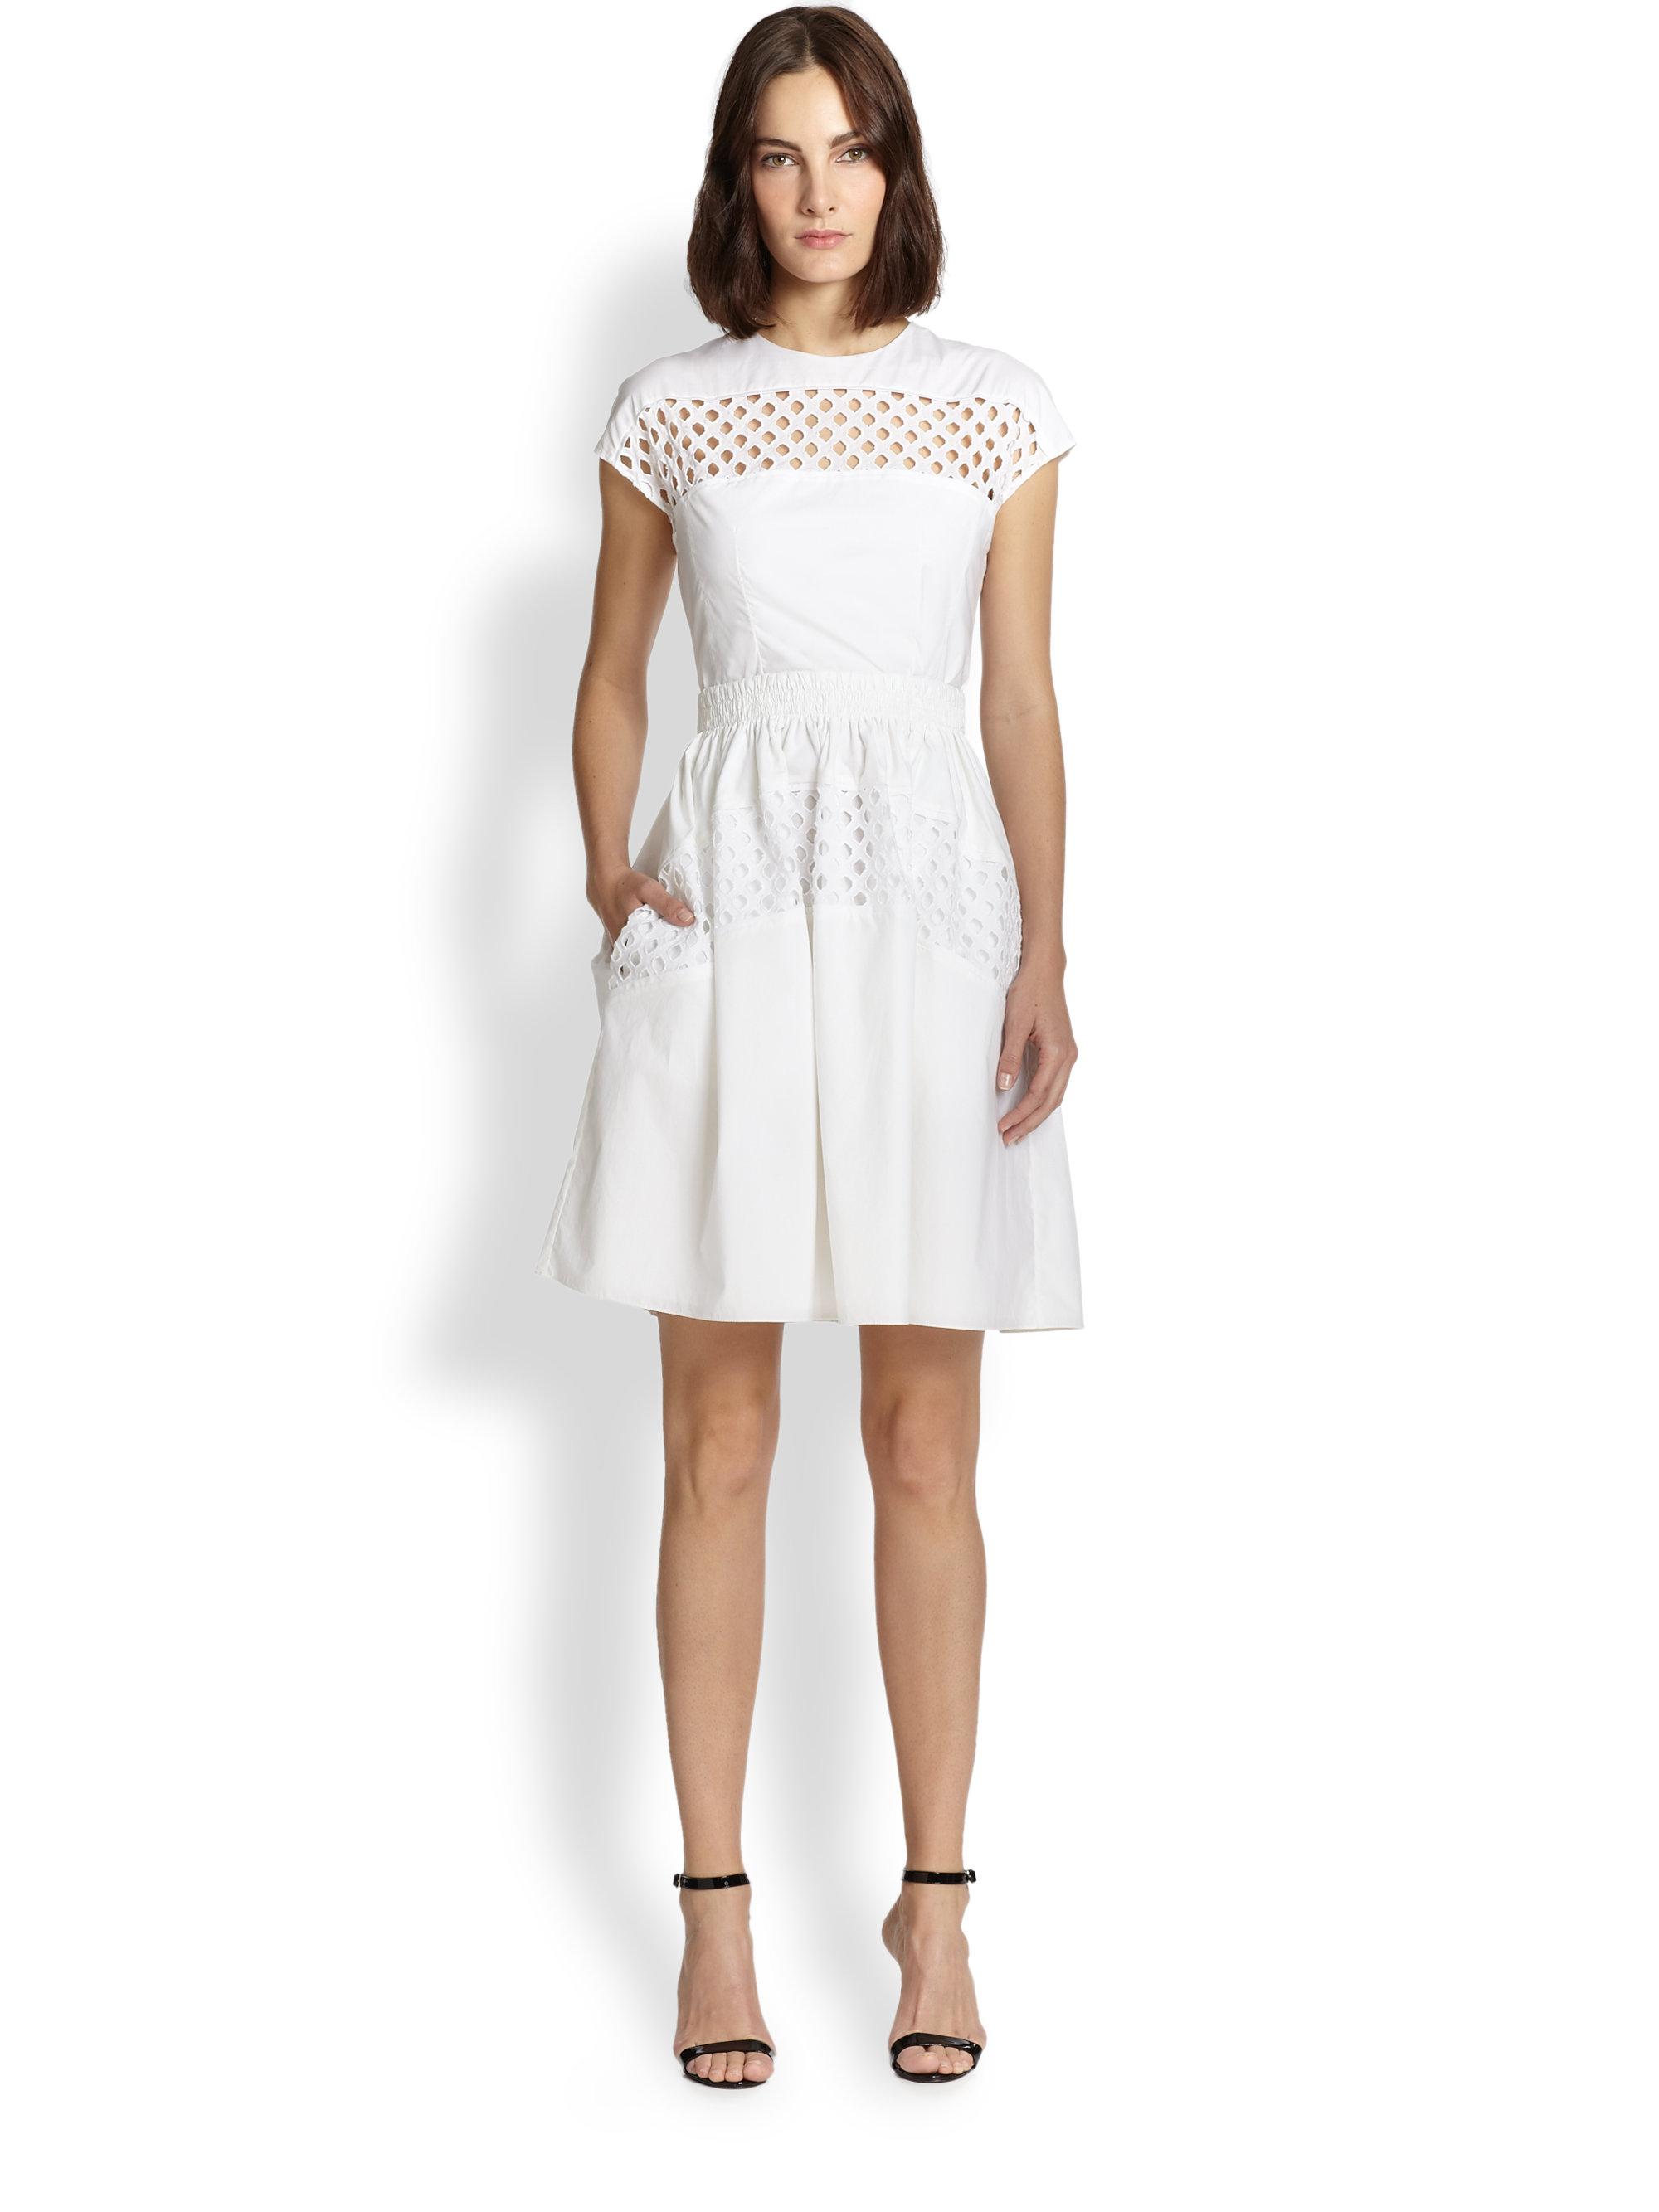 Lyst - Carven Lattice Cut-out Cotton Dress in White